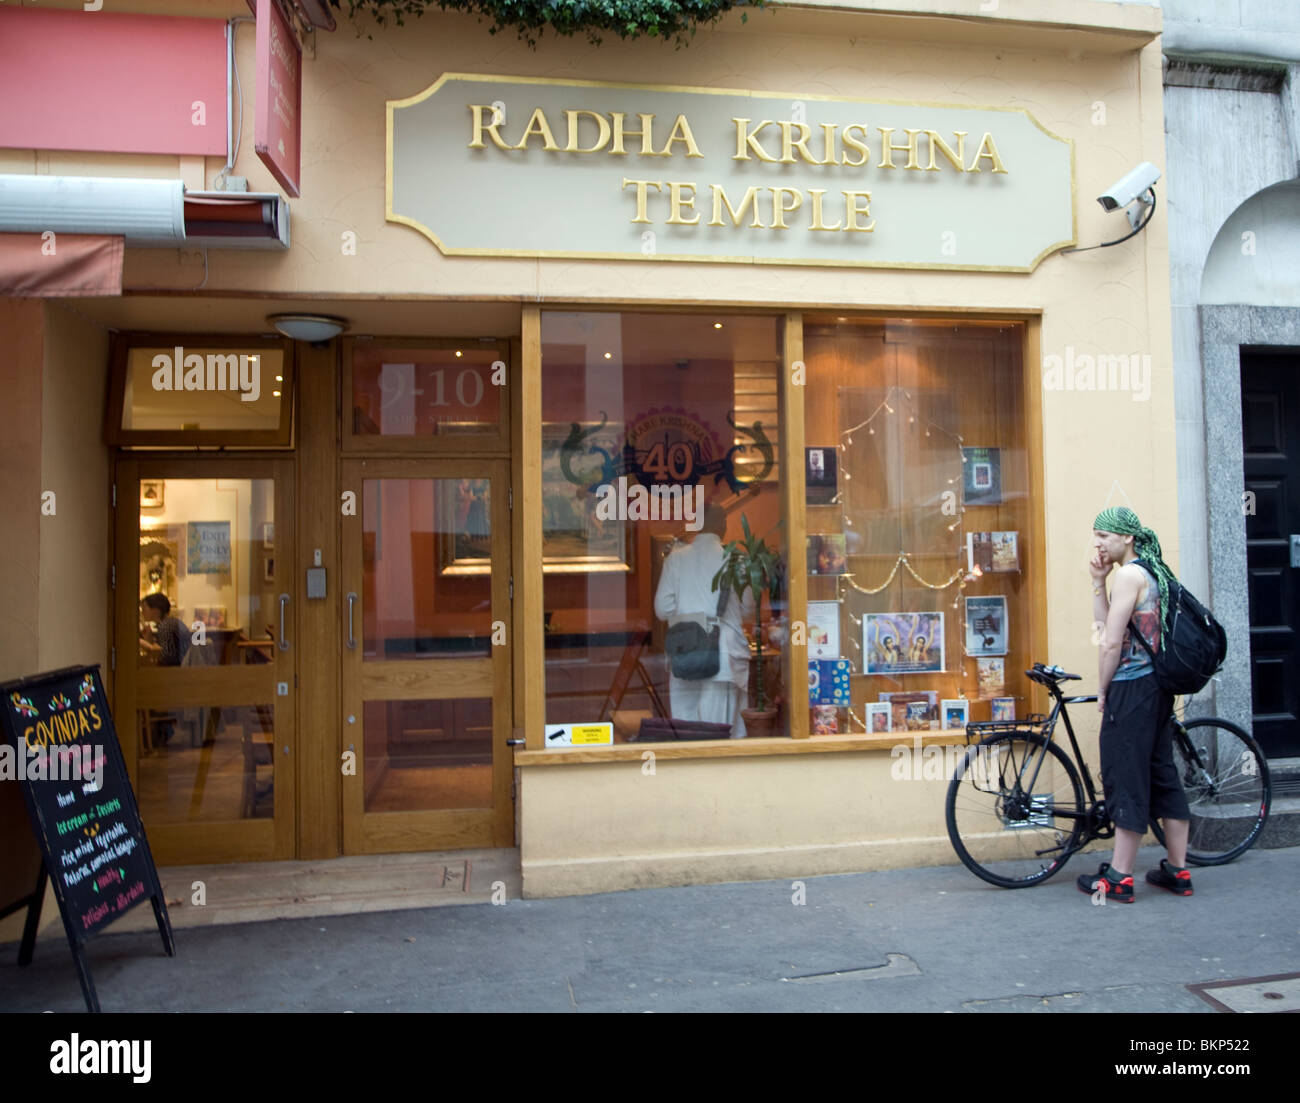 Radha Krishna temple, London, England - Stock Image